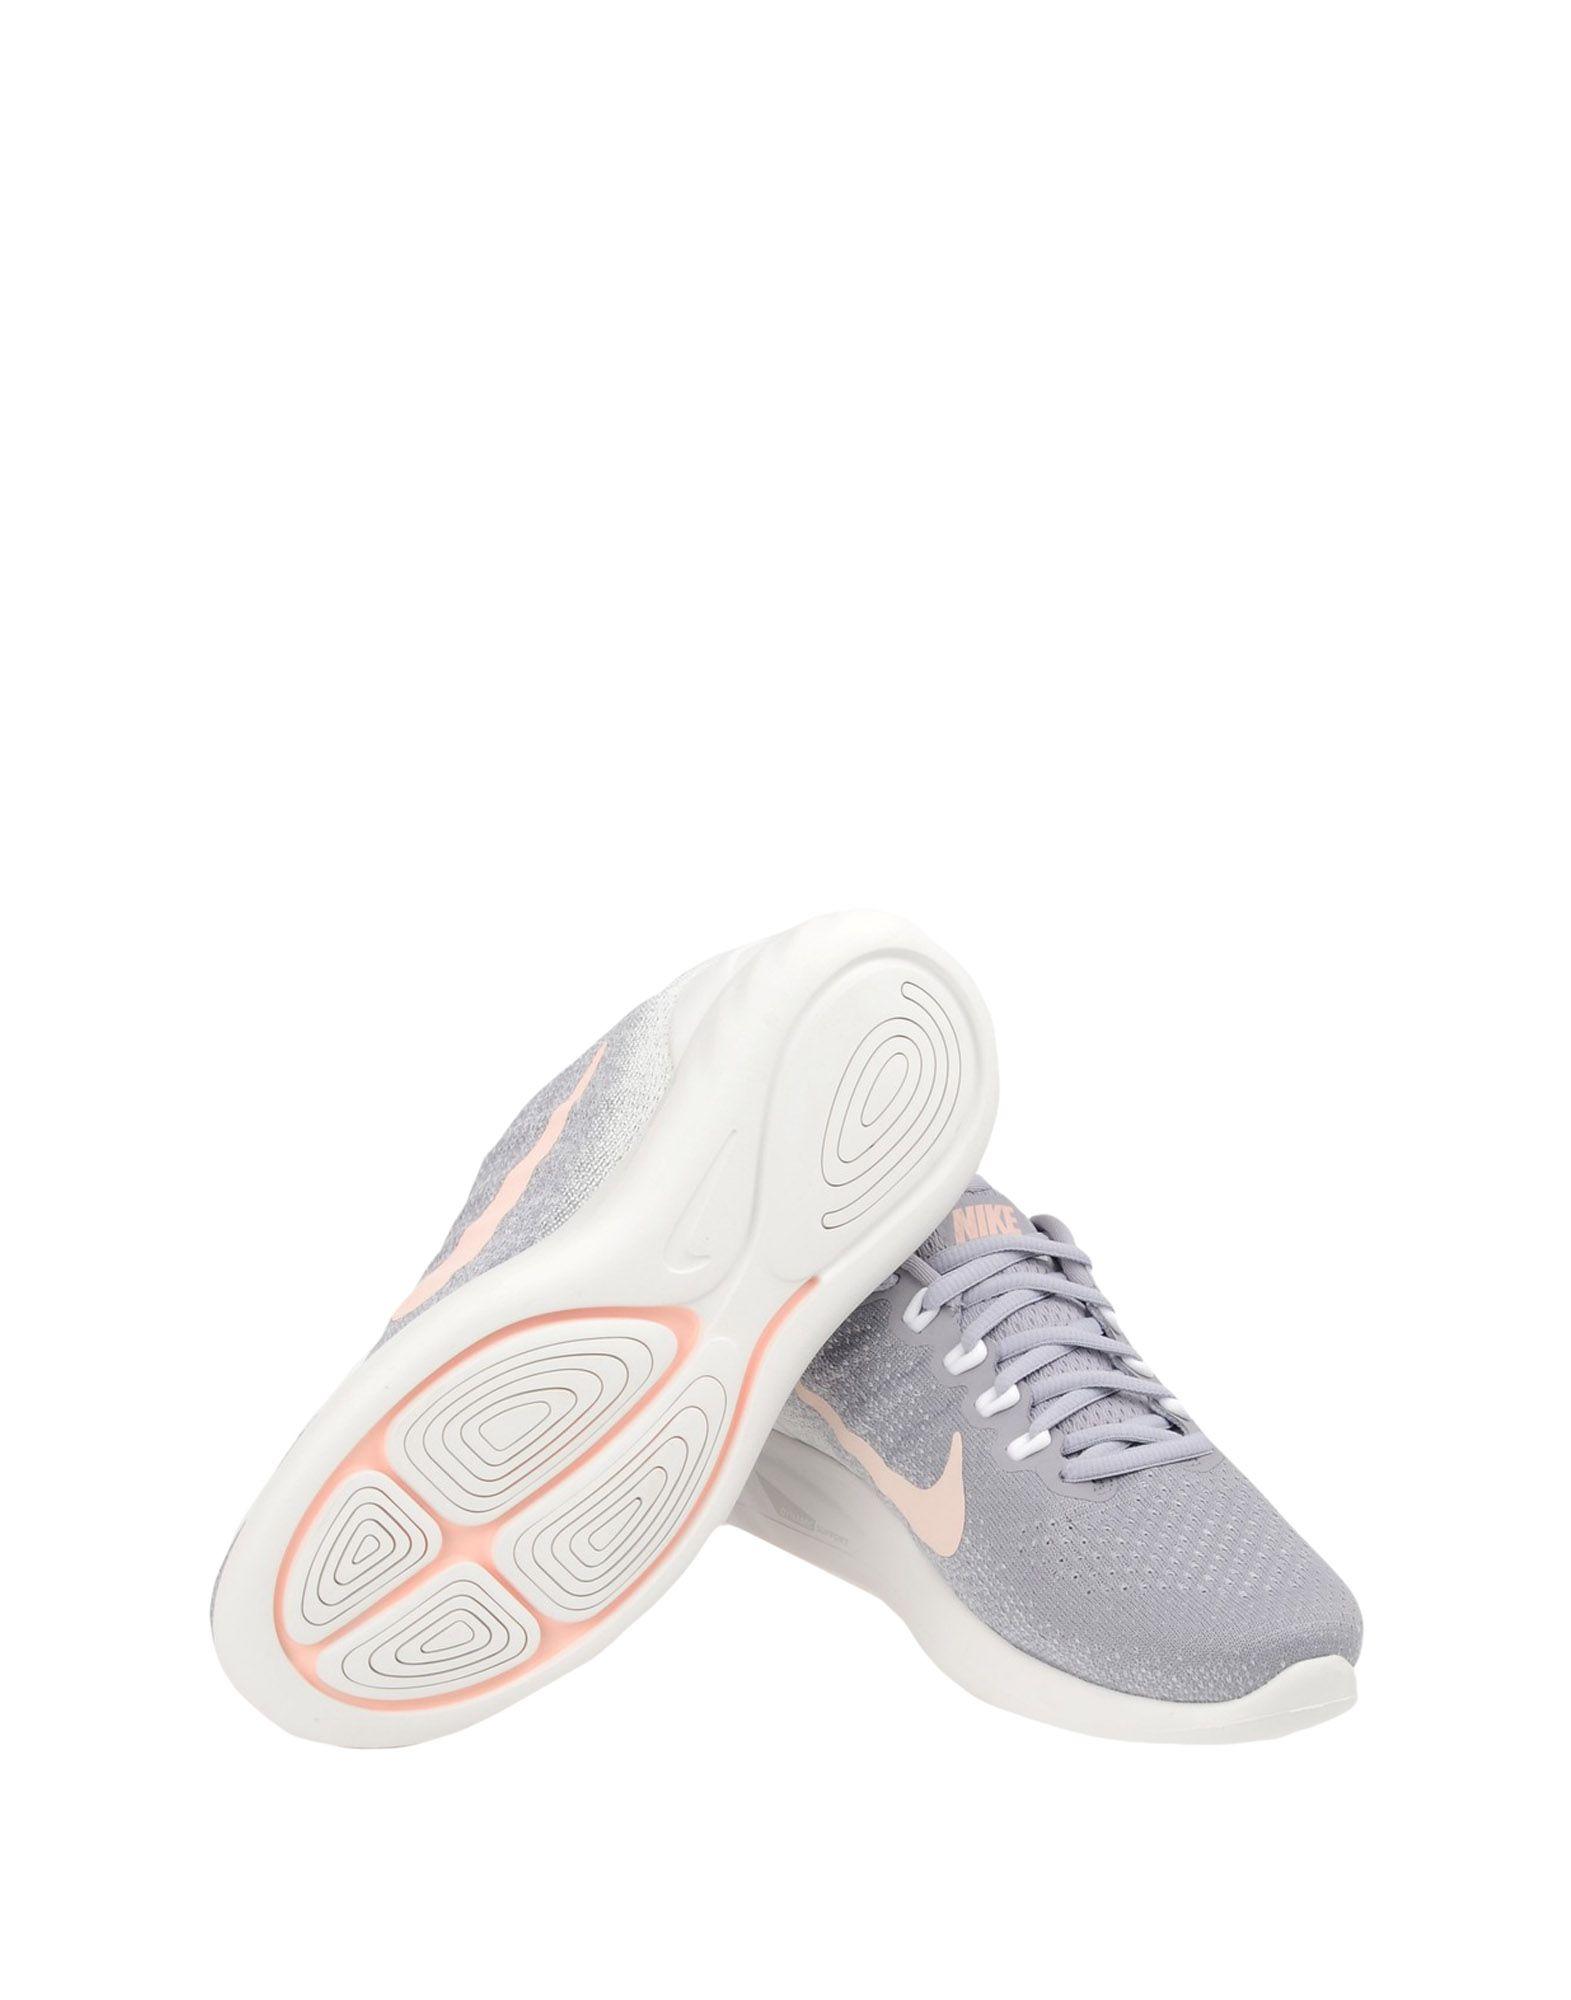 Sneakers Nike   Lunarglide 9 - Femme - Sneakers Nike sur